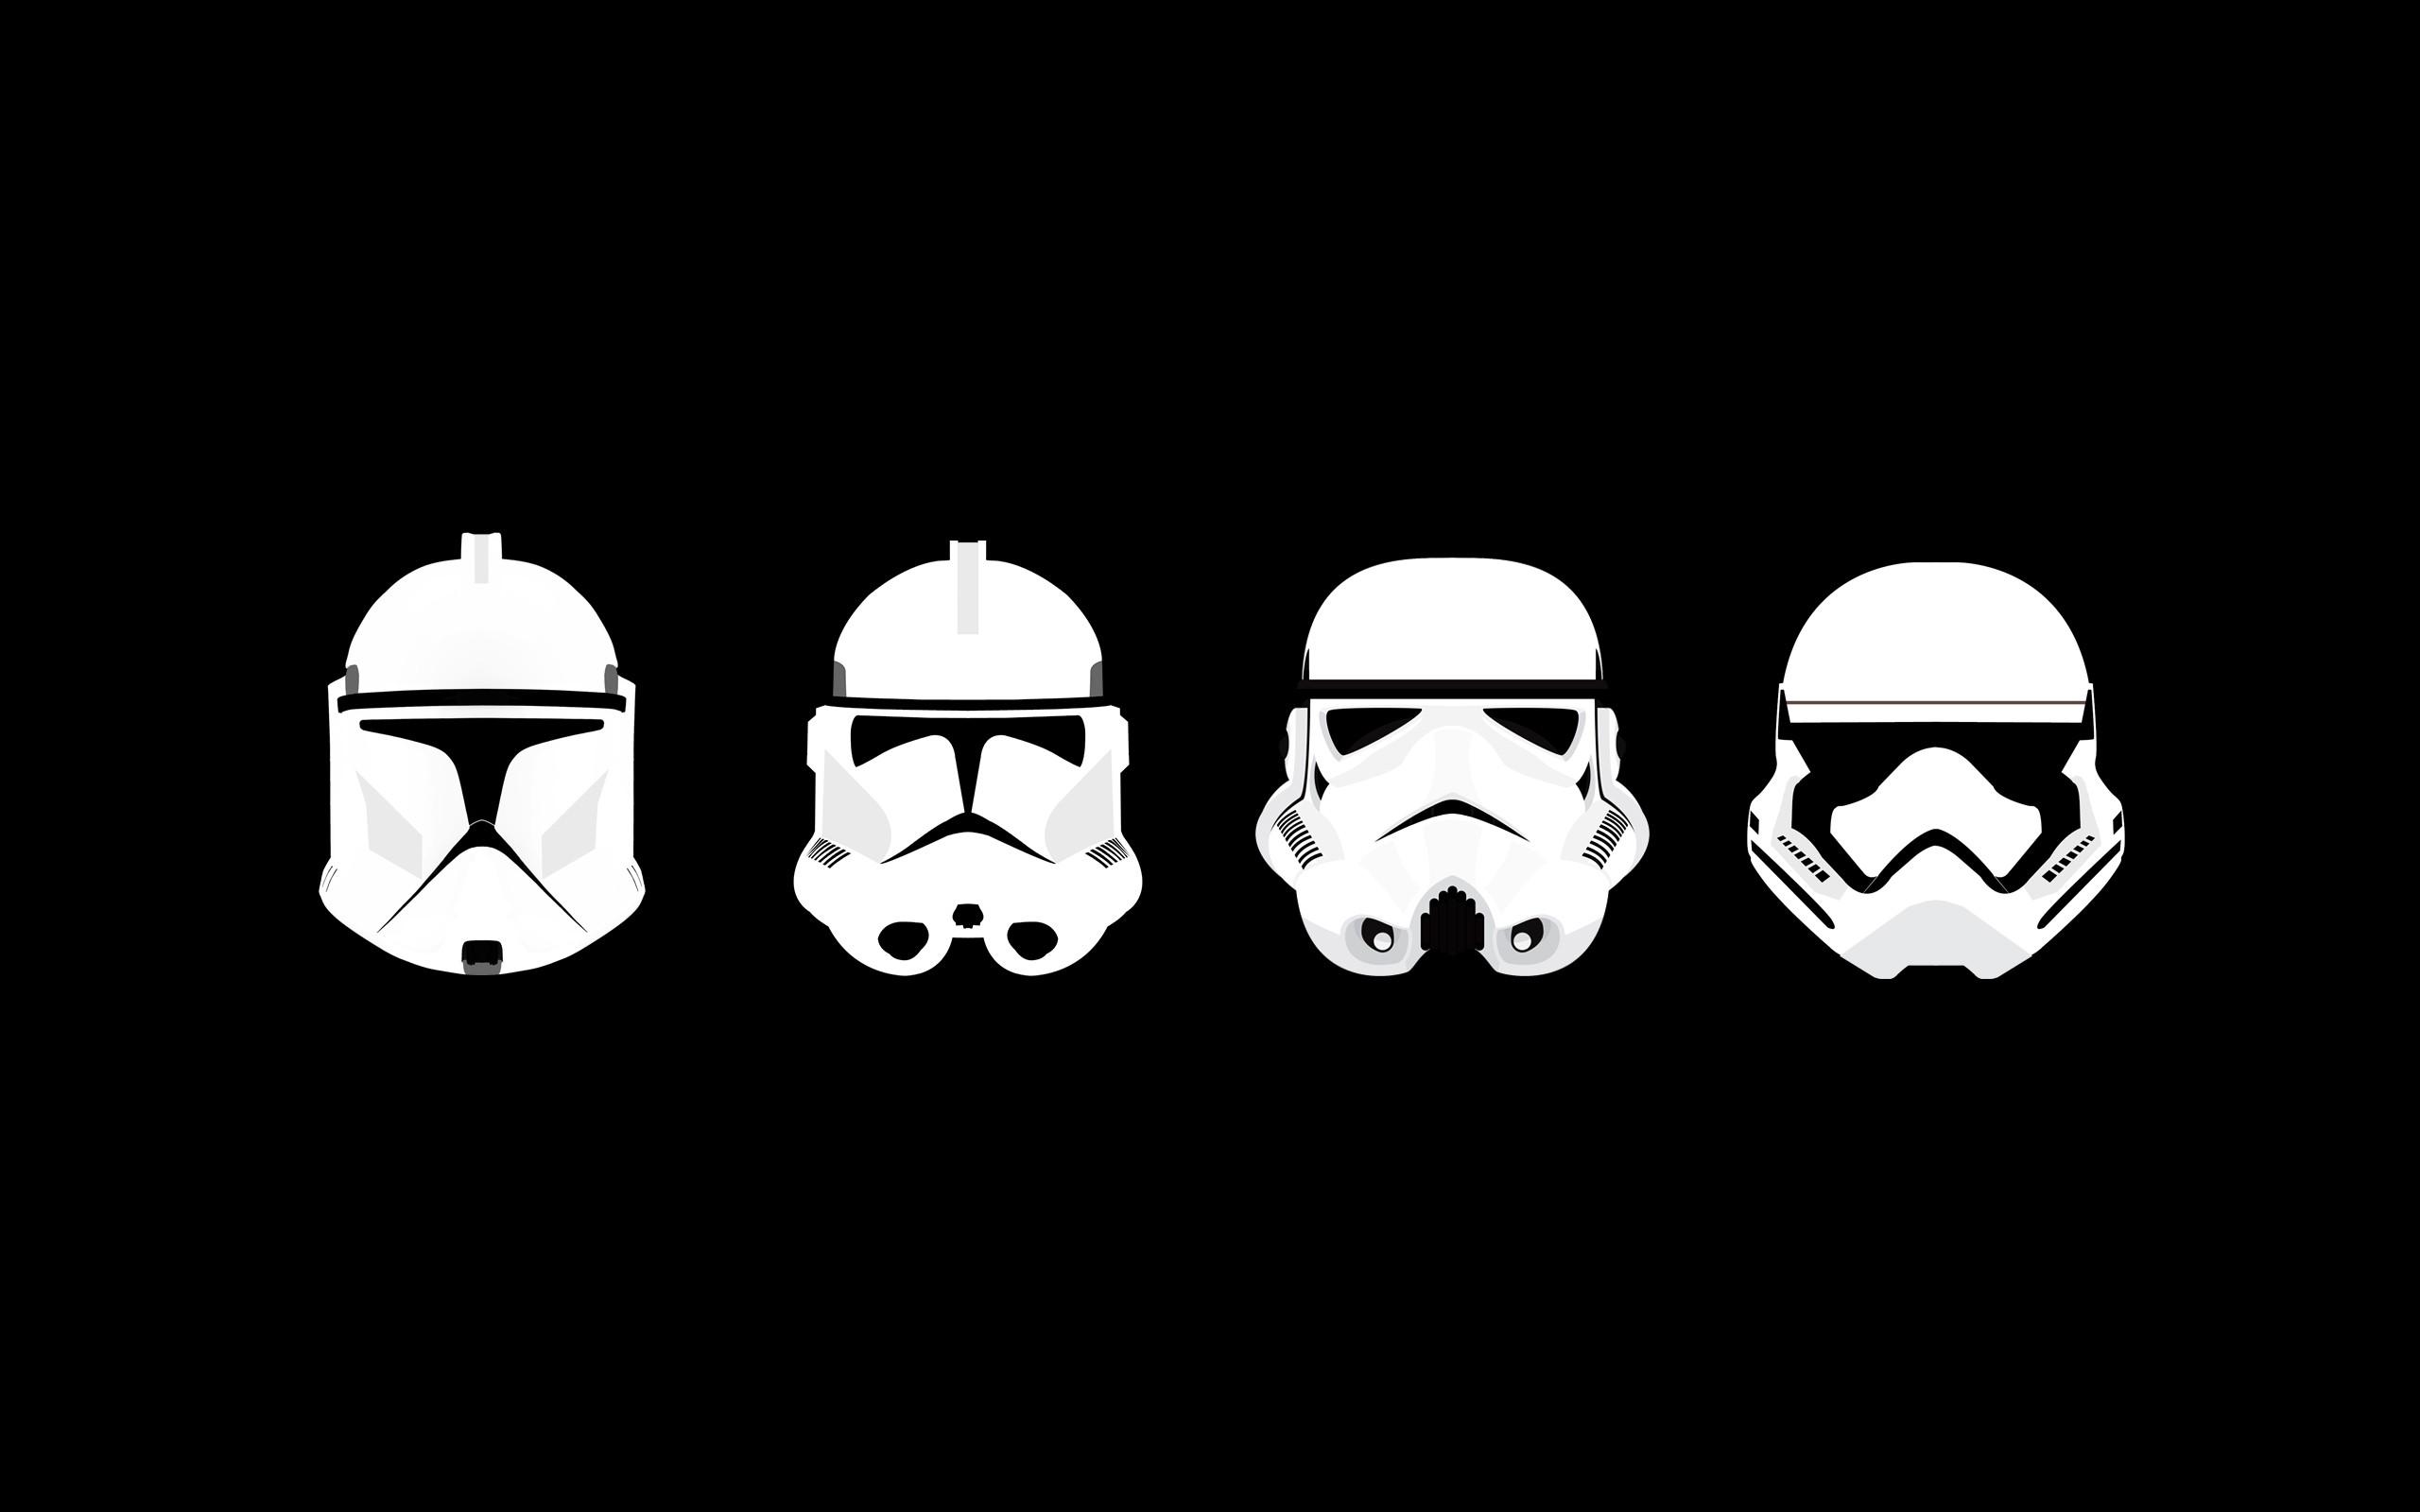 FHDQ Stormtrooper Wallpapers Collection for Desktop